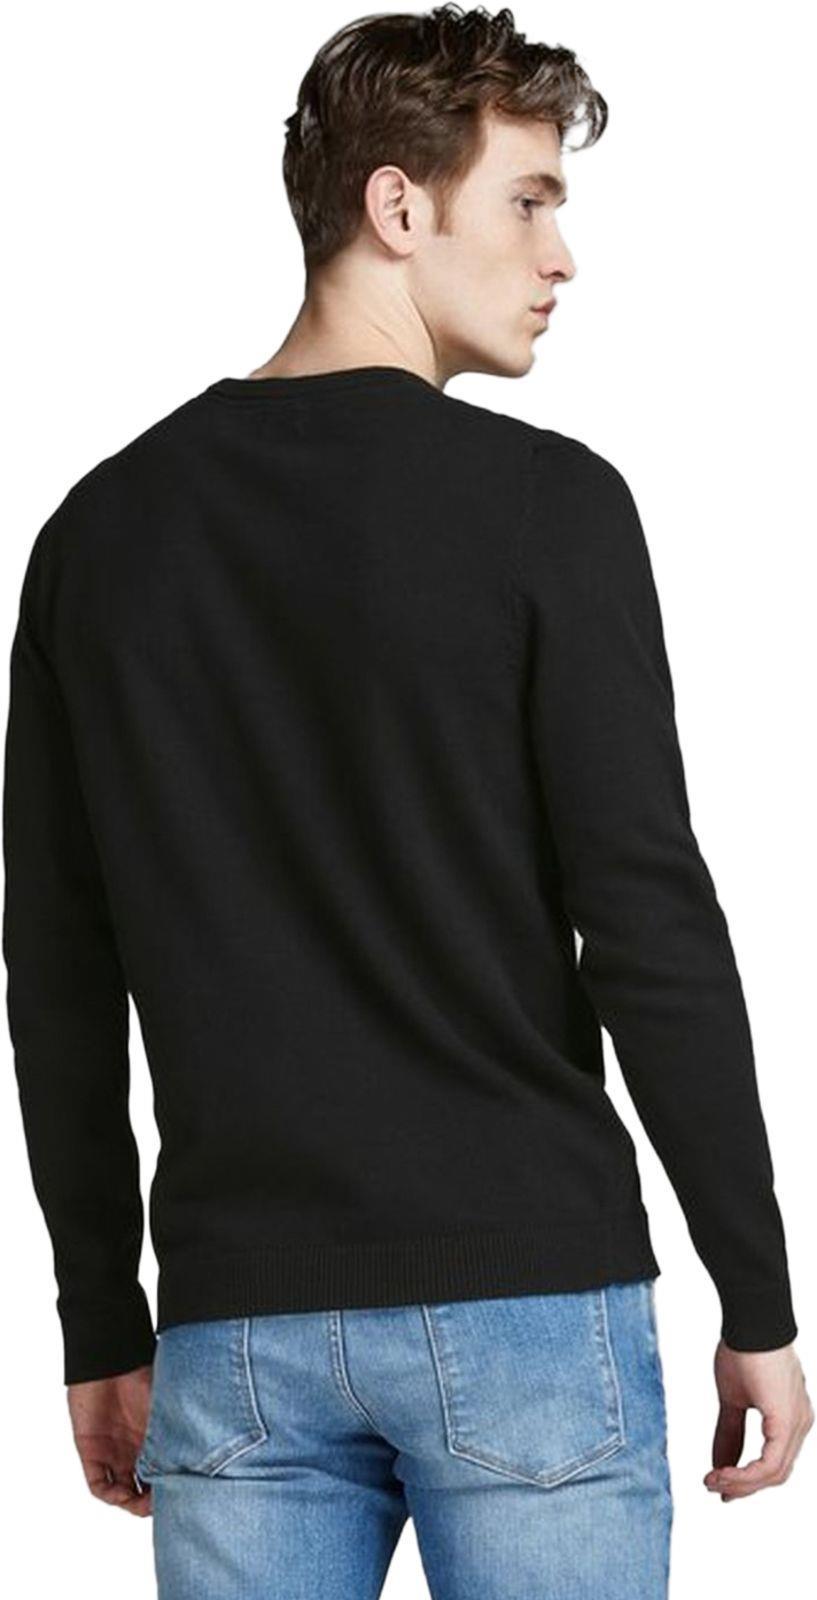 Jack-amp-Jones-Jumpers-Sweaters-Cardigans-Assorted-S-XXL miniatuur 3